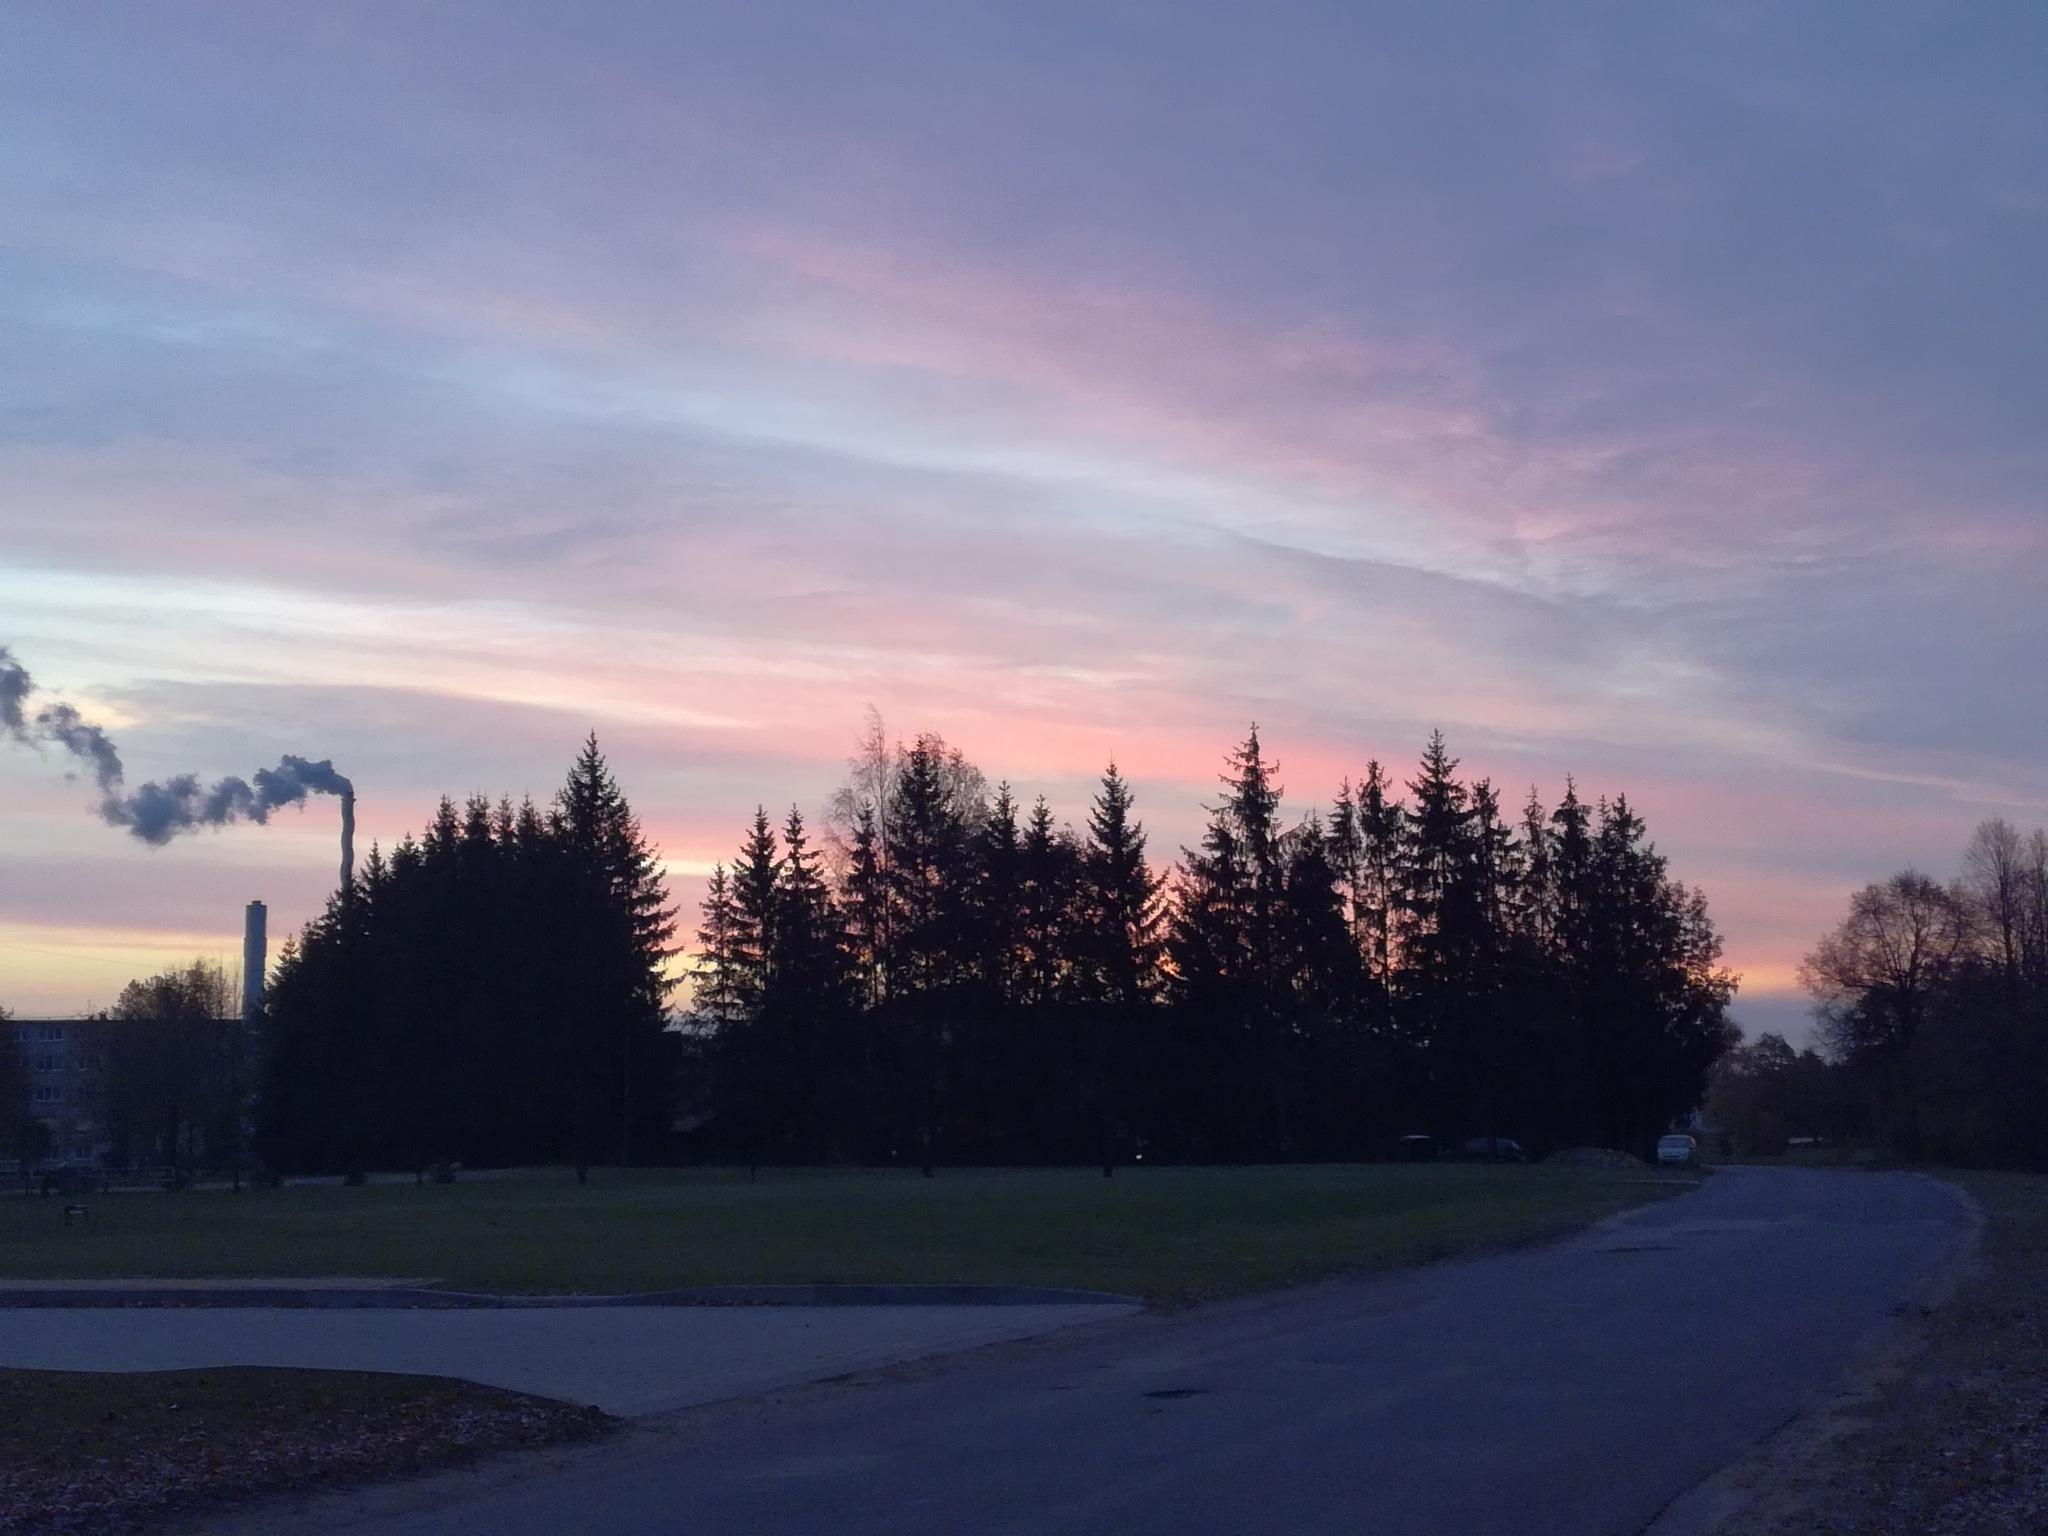 Morning sky by uzkuraitiene62